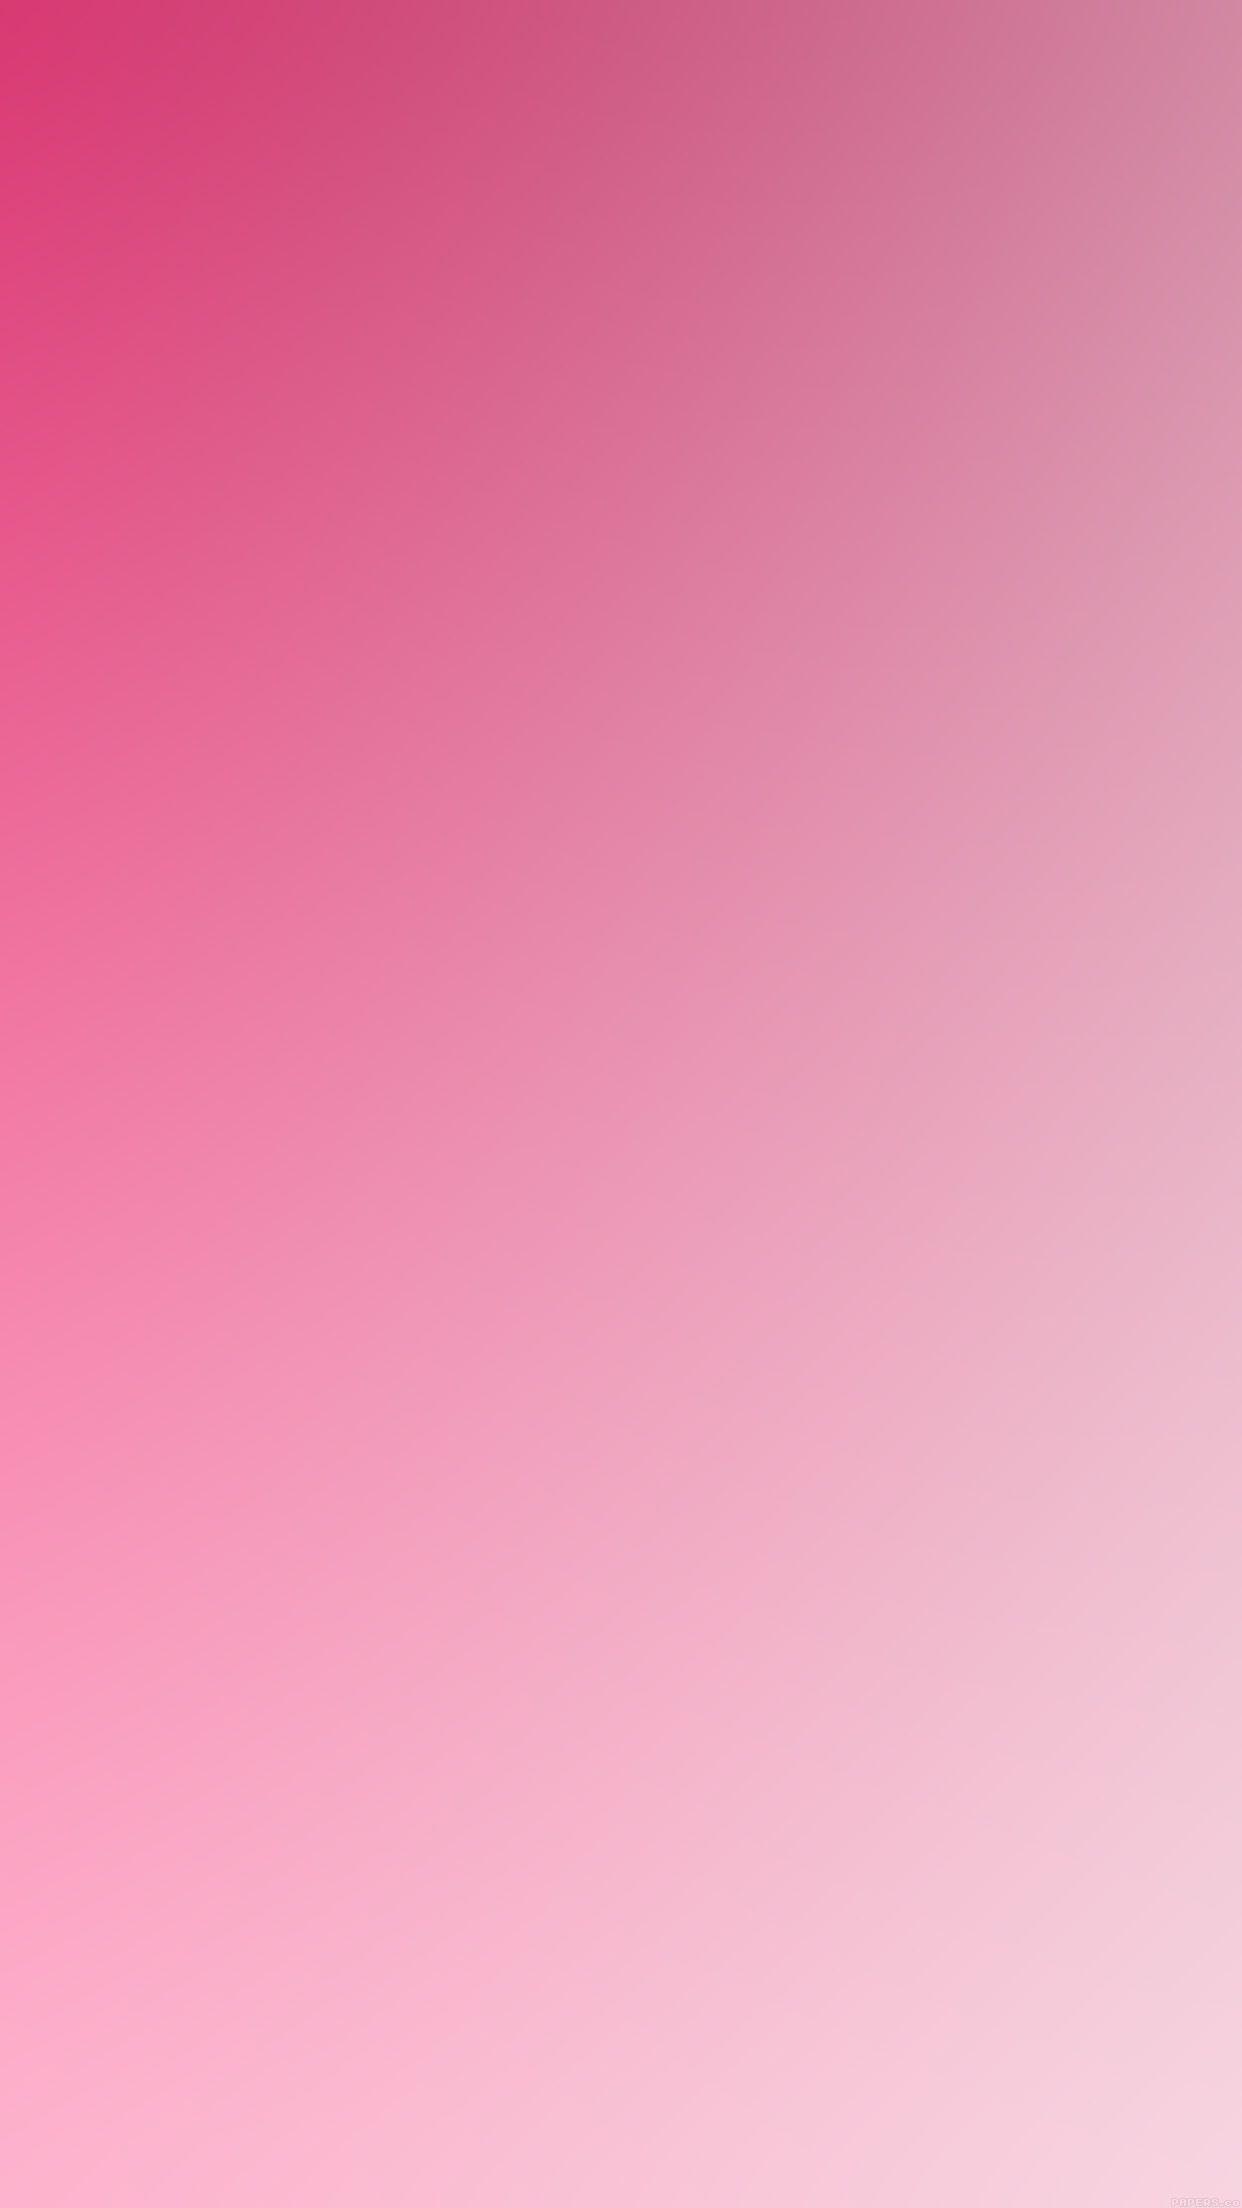 Fond ecran rose 1242 2208 fond cran pinterest for Fond ecran rose